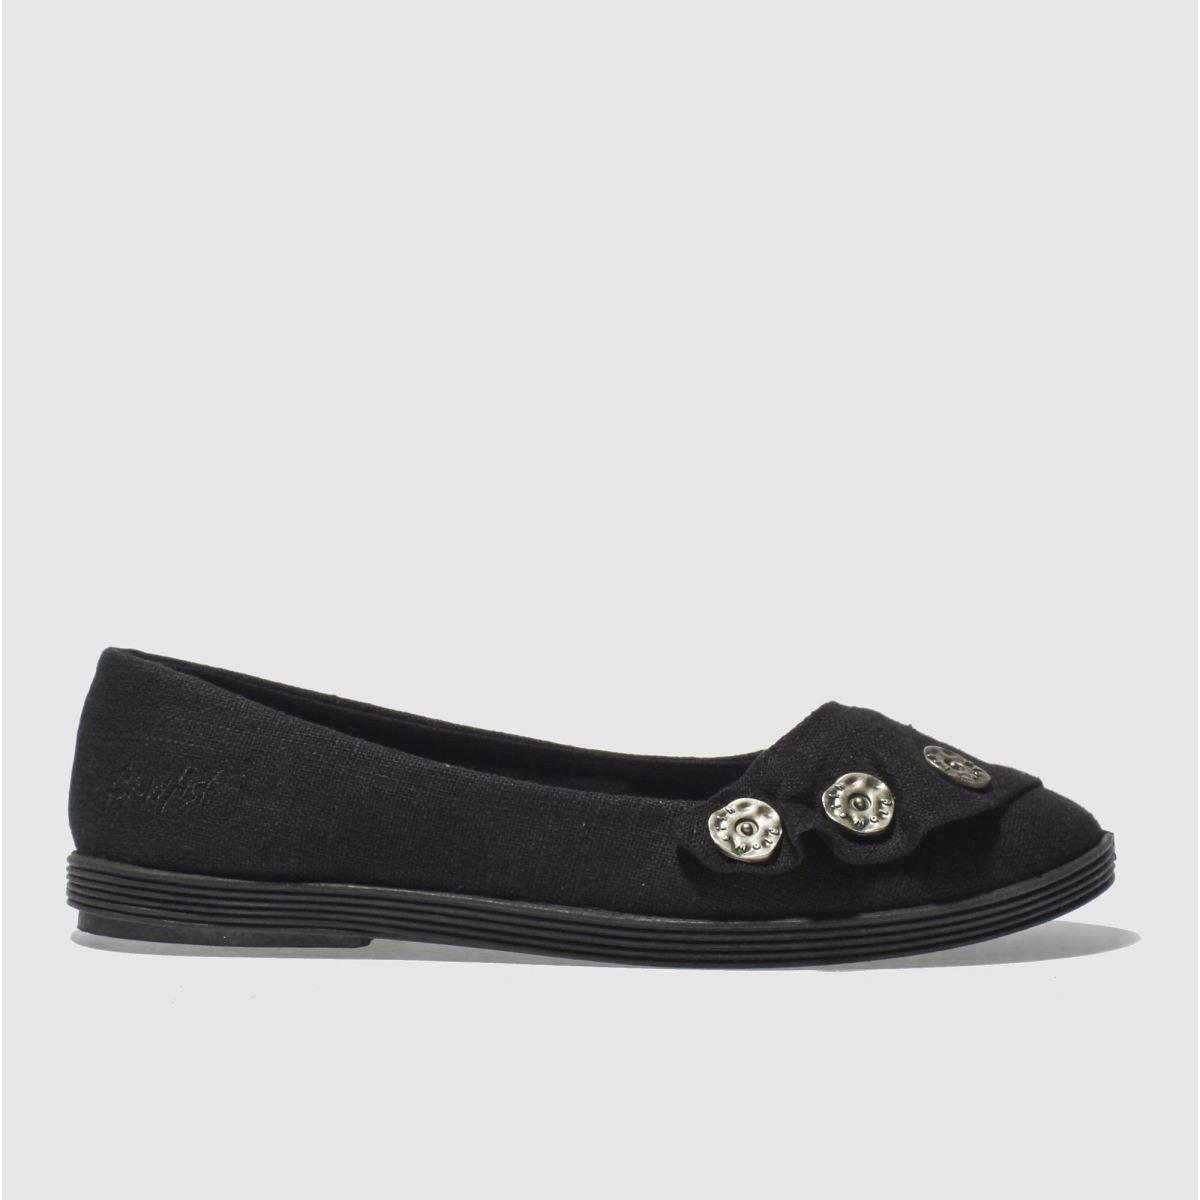 blowfish black garden linen flat shoes